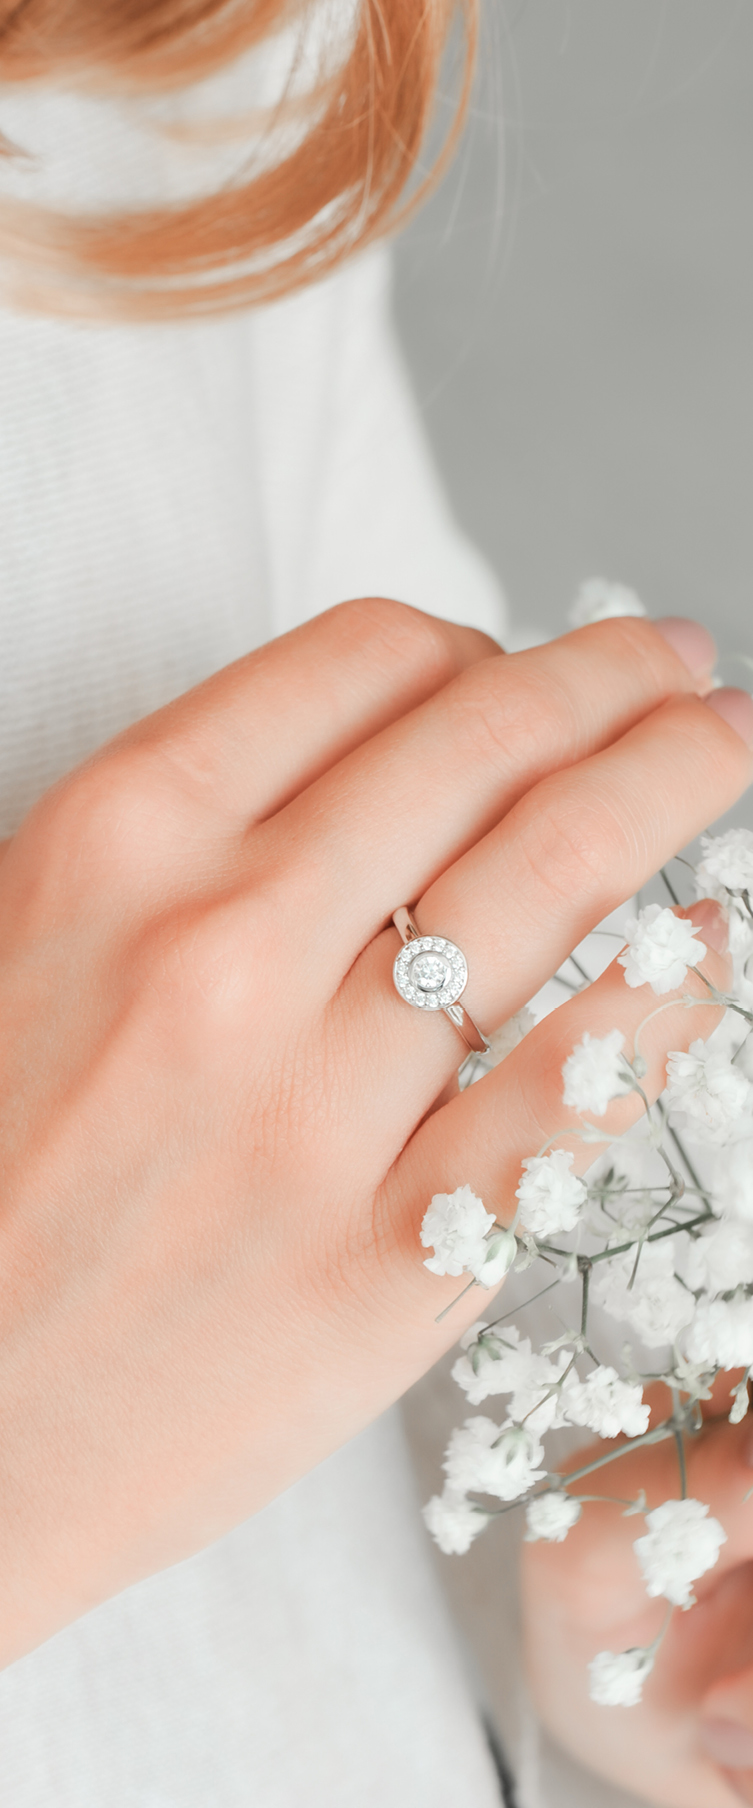 Silver jewelers